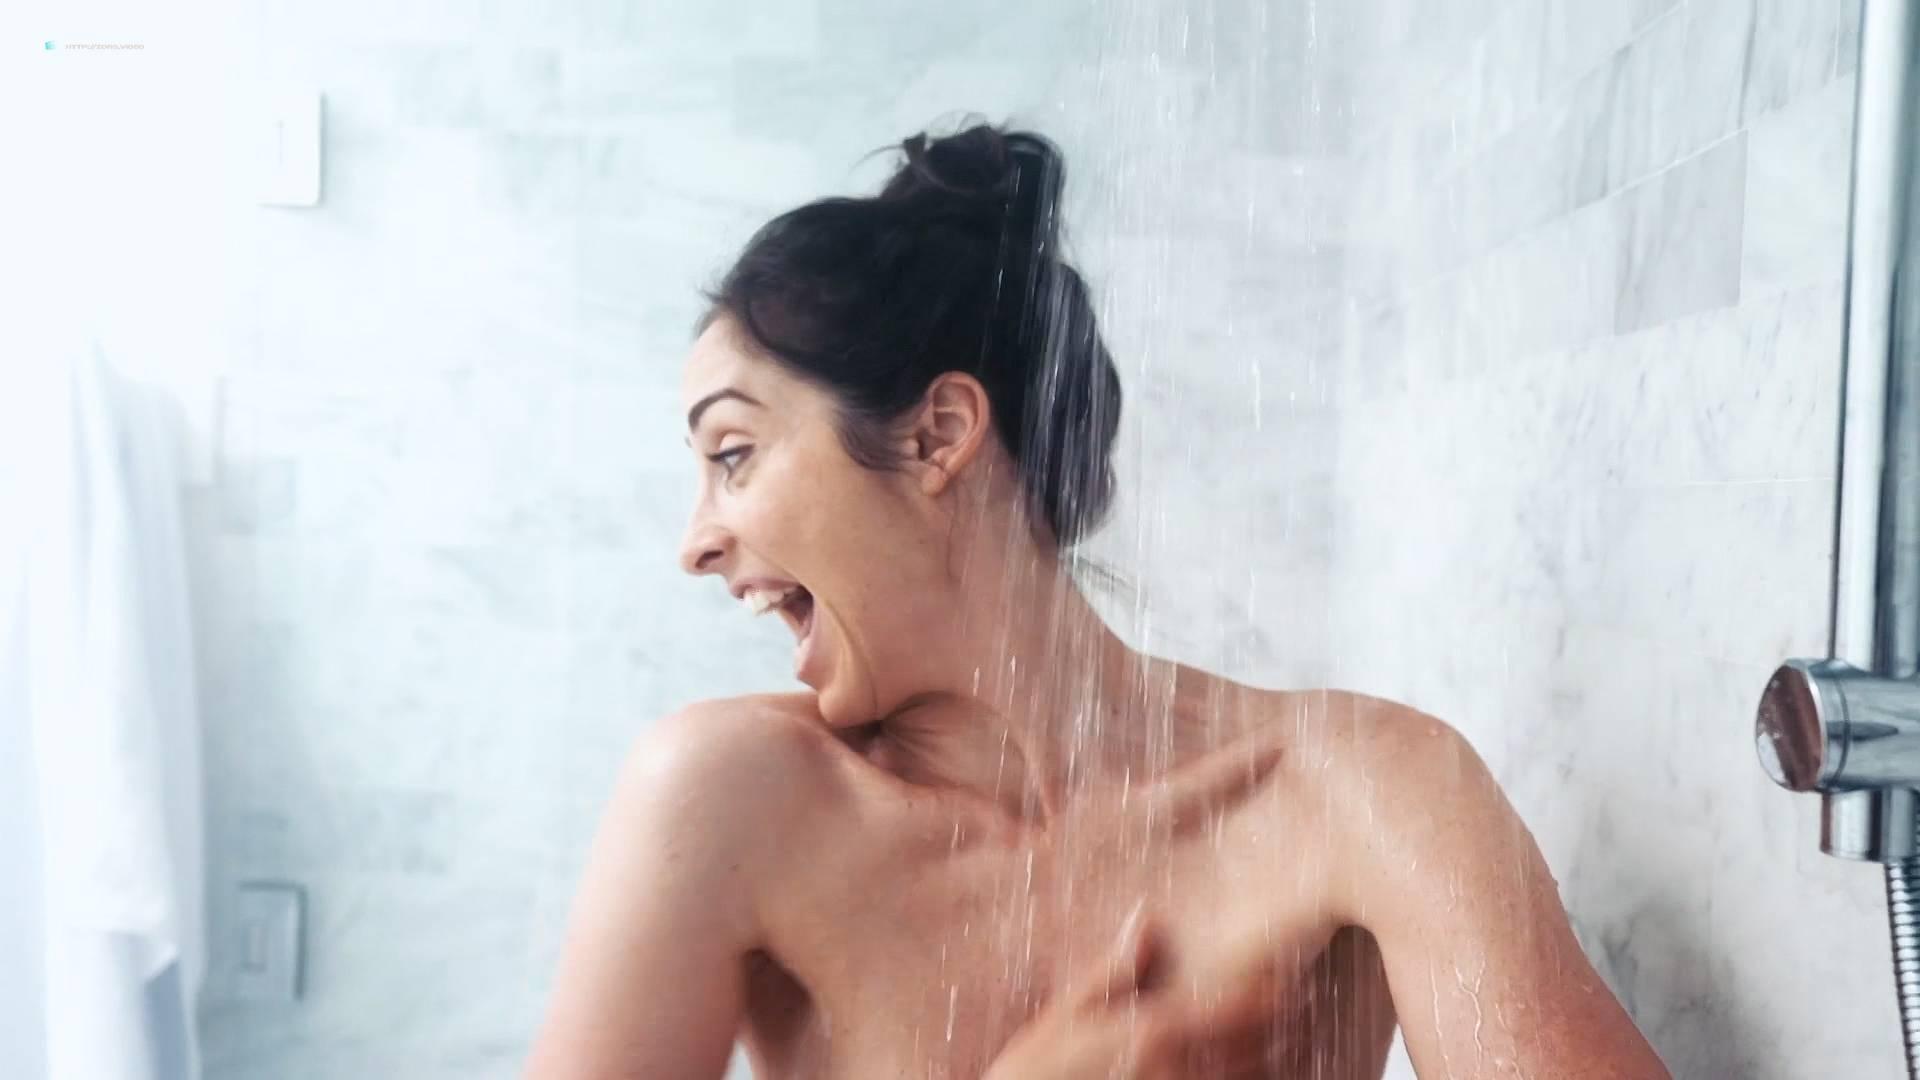 Shower savage sex